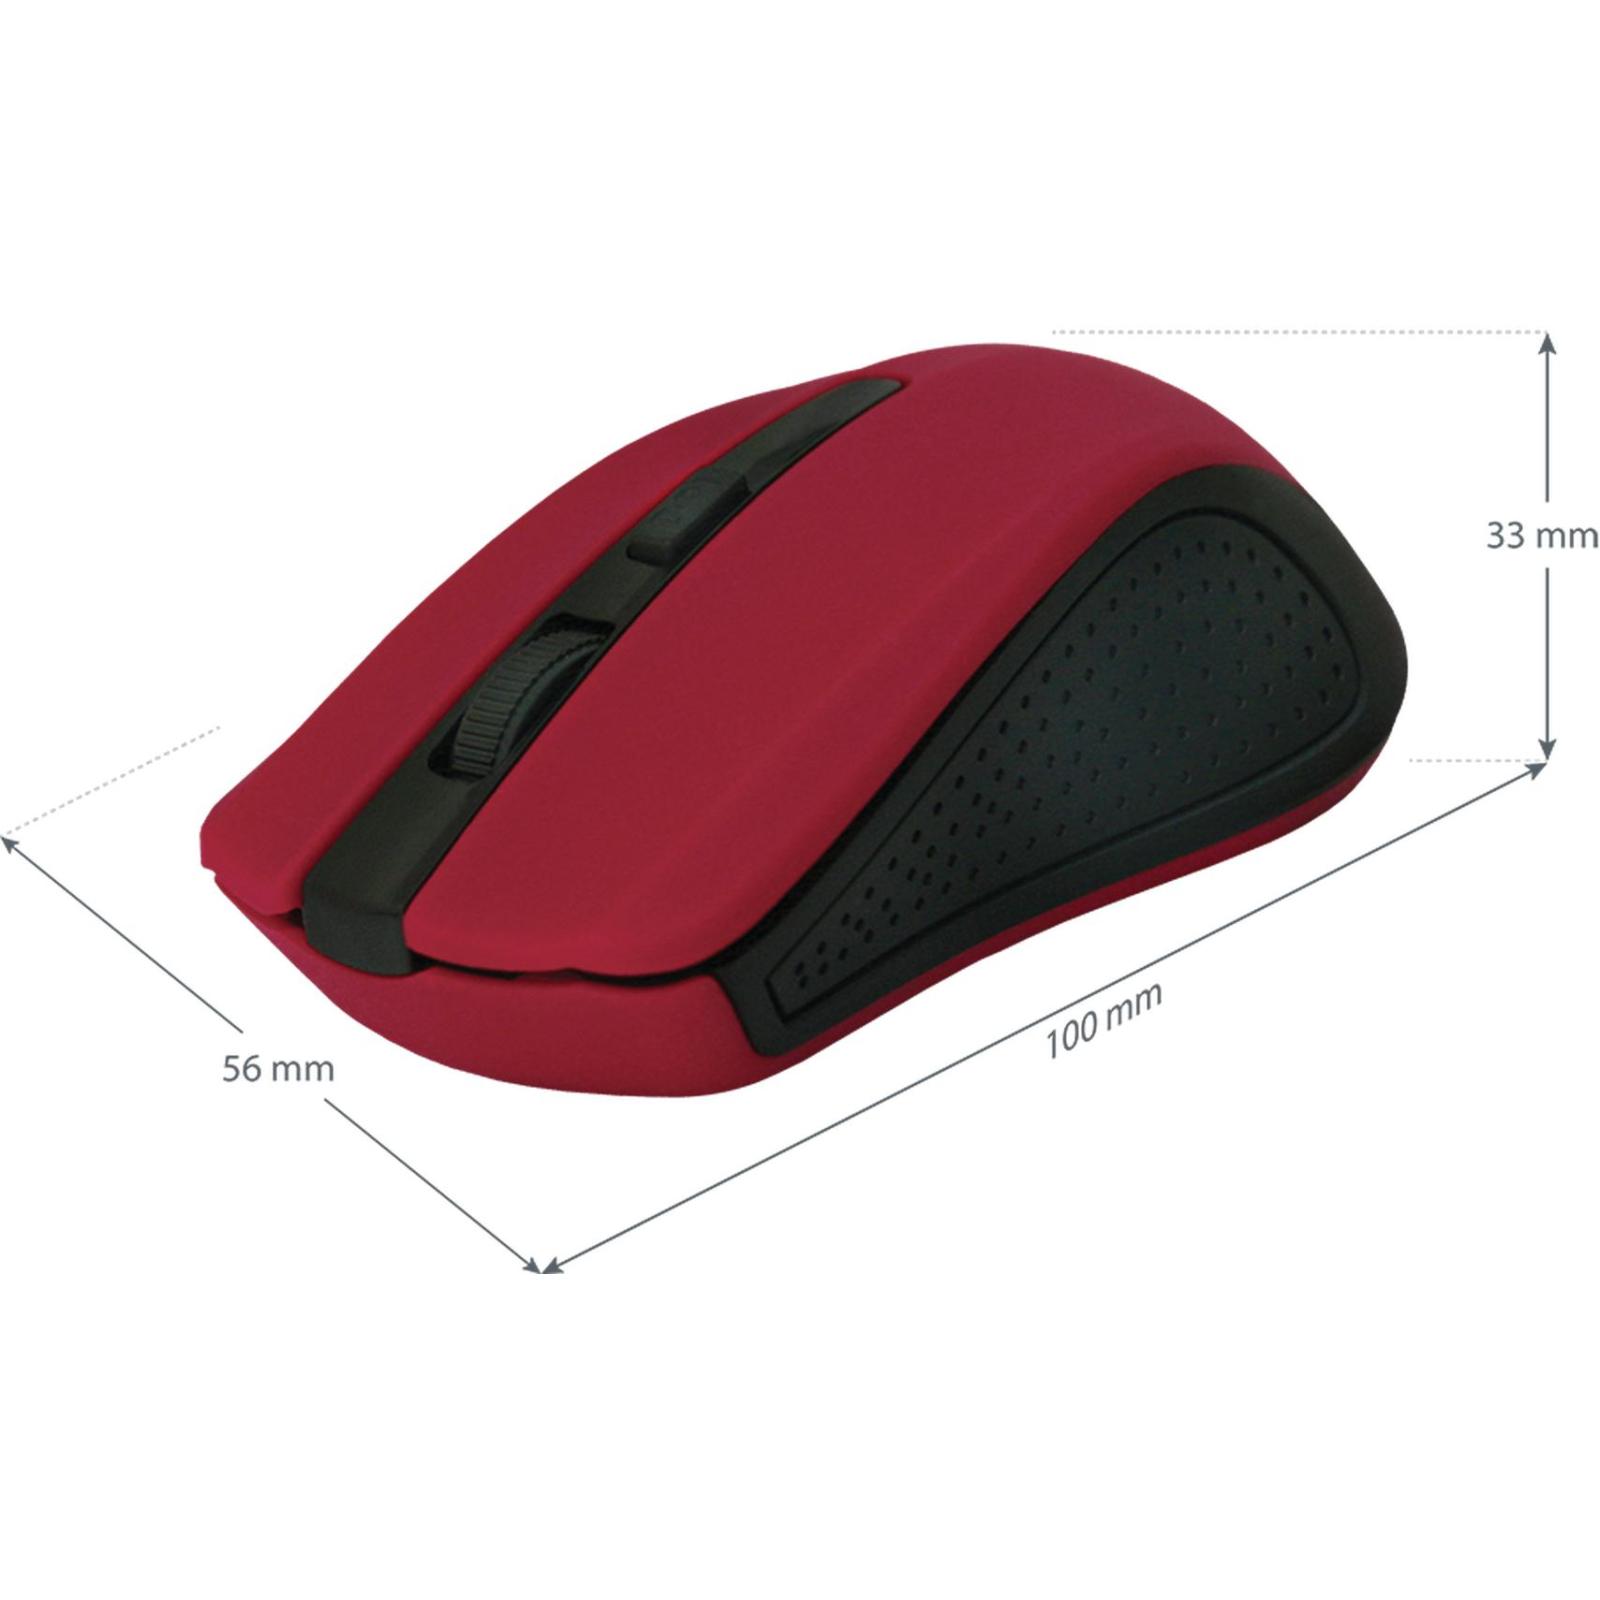 Мышка Defender Accura MM-935 Black (52935) изображение 3